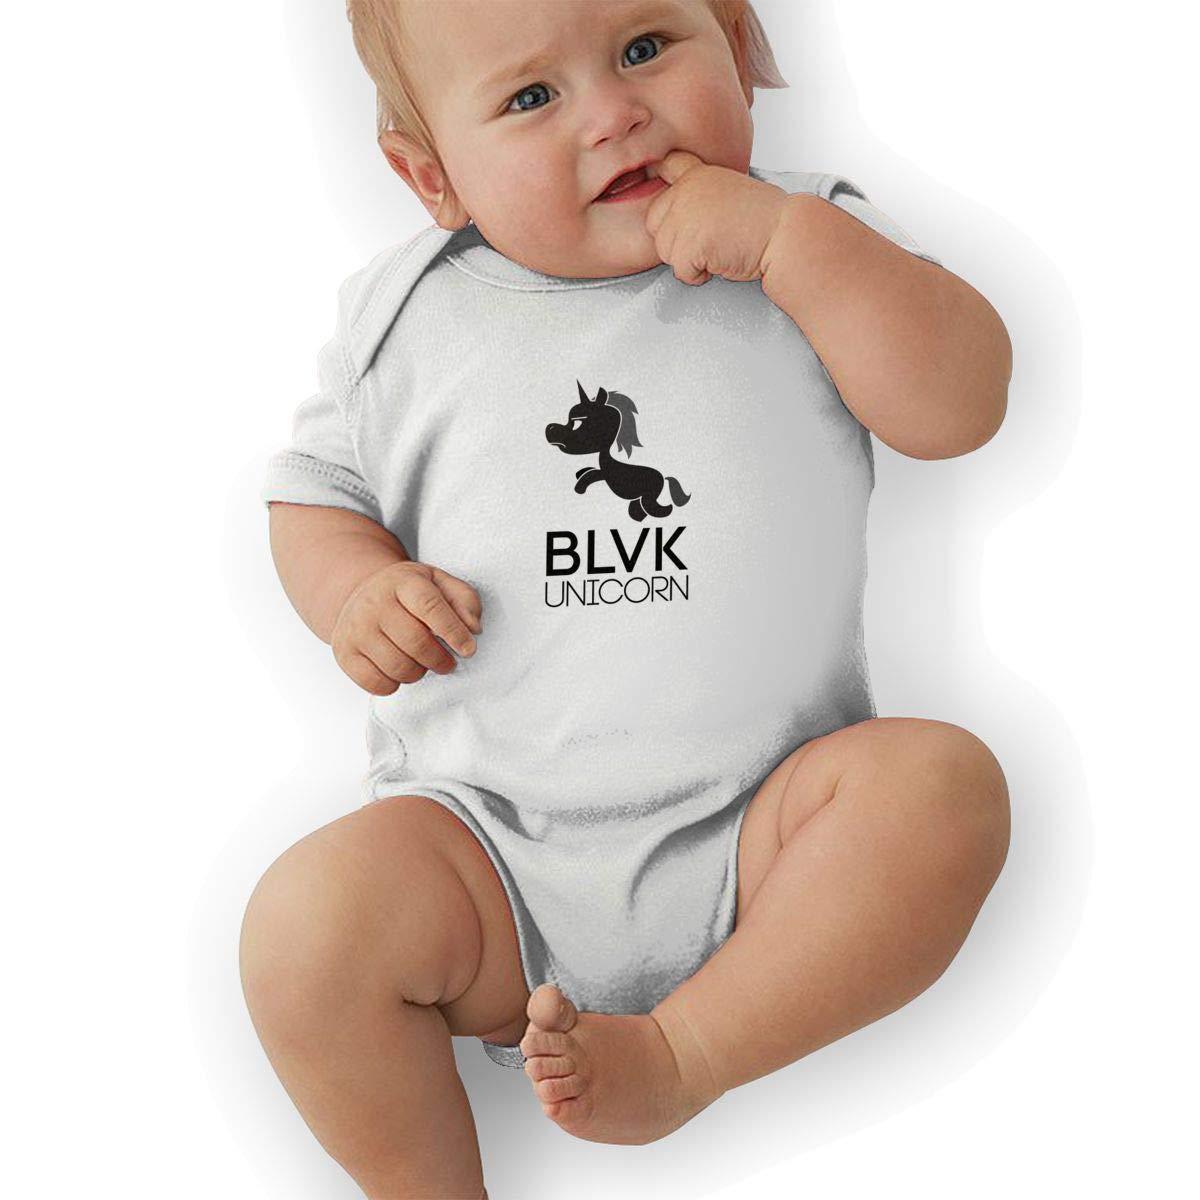 Funny Cute Unicorn Newborn Baby Short Sleeve Romper Infant Summer Clothing